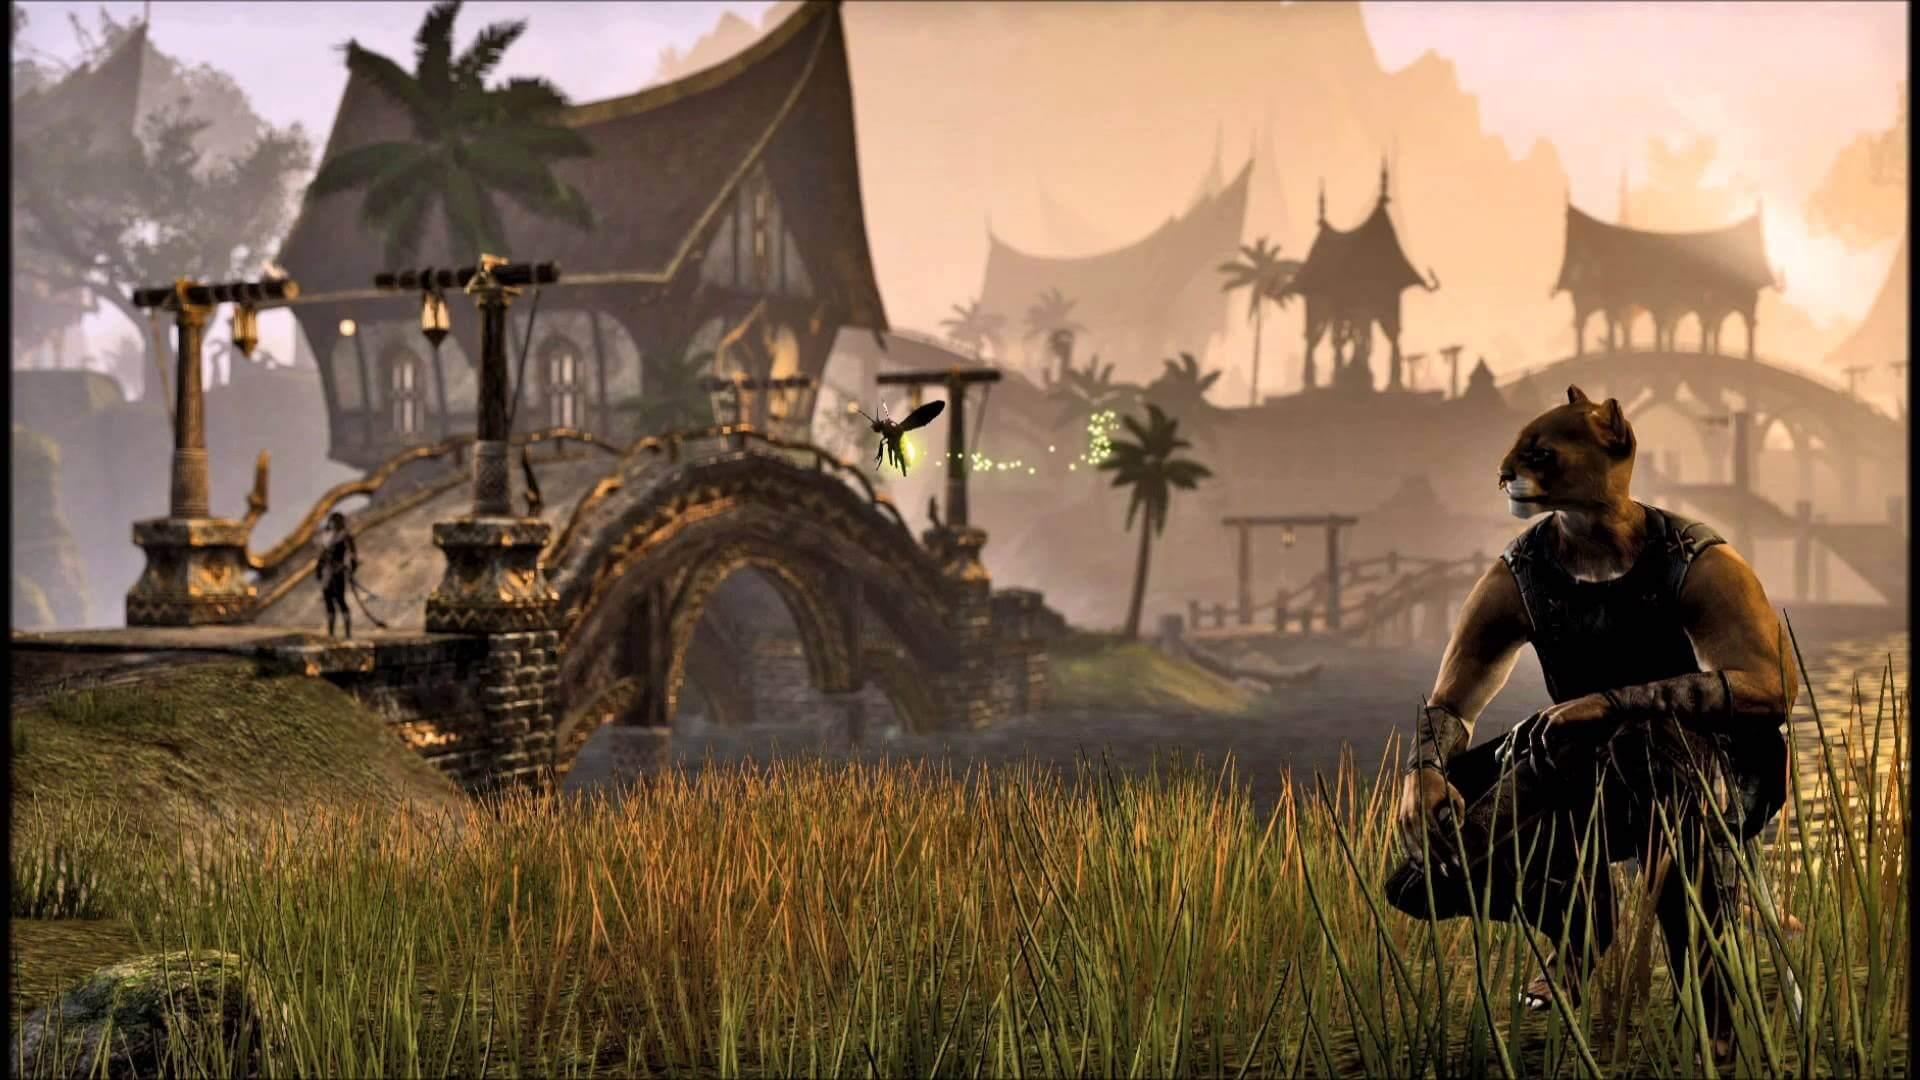 The Elder Scrolls Online: Tamriel Unlimited - Crown Edition